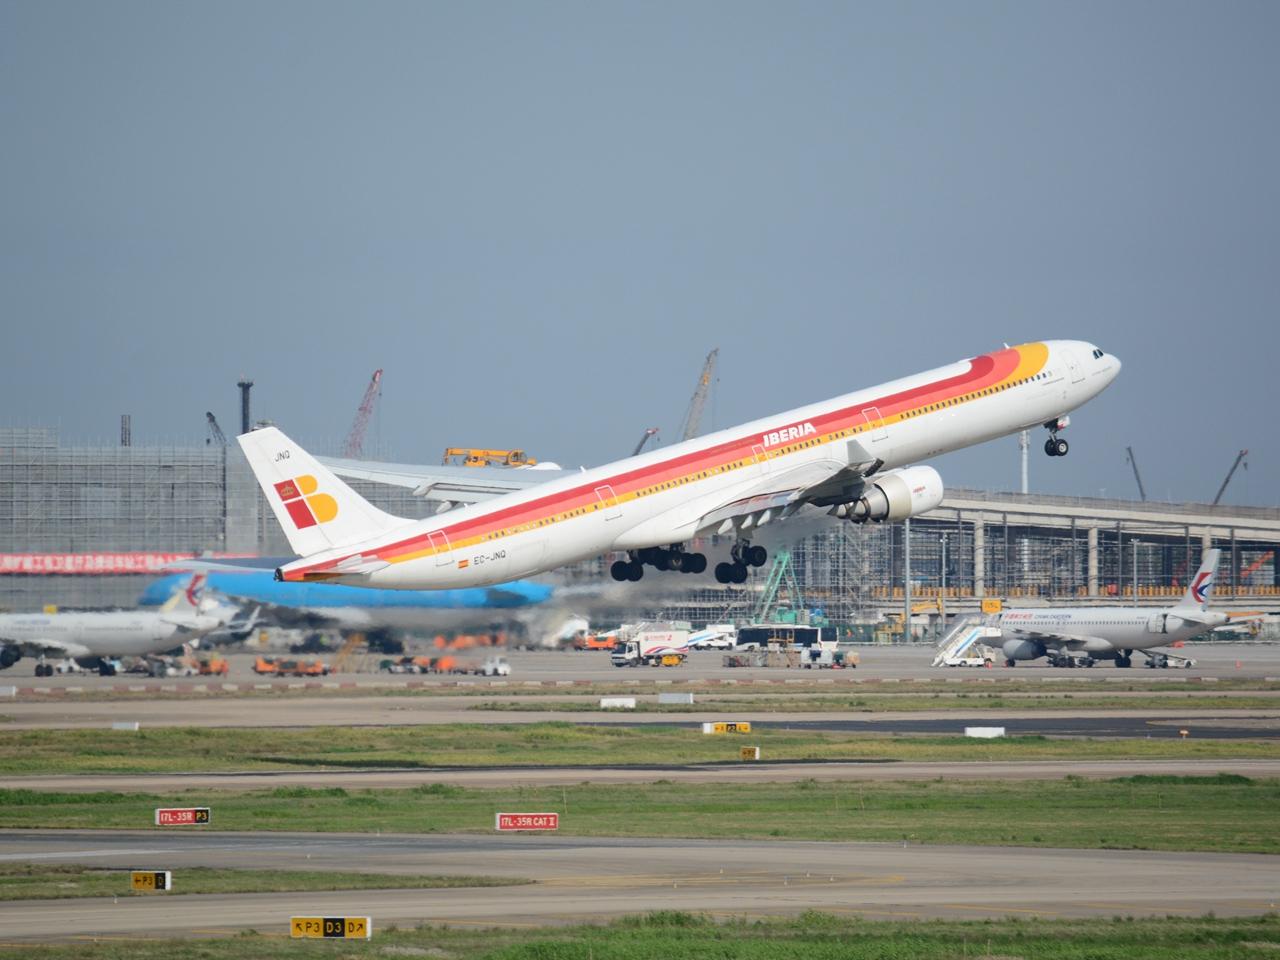 Re:[原创](多图一机)西班牙航空PVG起飞 后面有彩蛋 AIRBUS A340-600 EC-JNQ 上海浦东国际机场